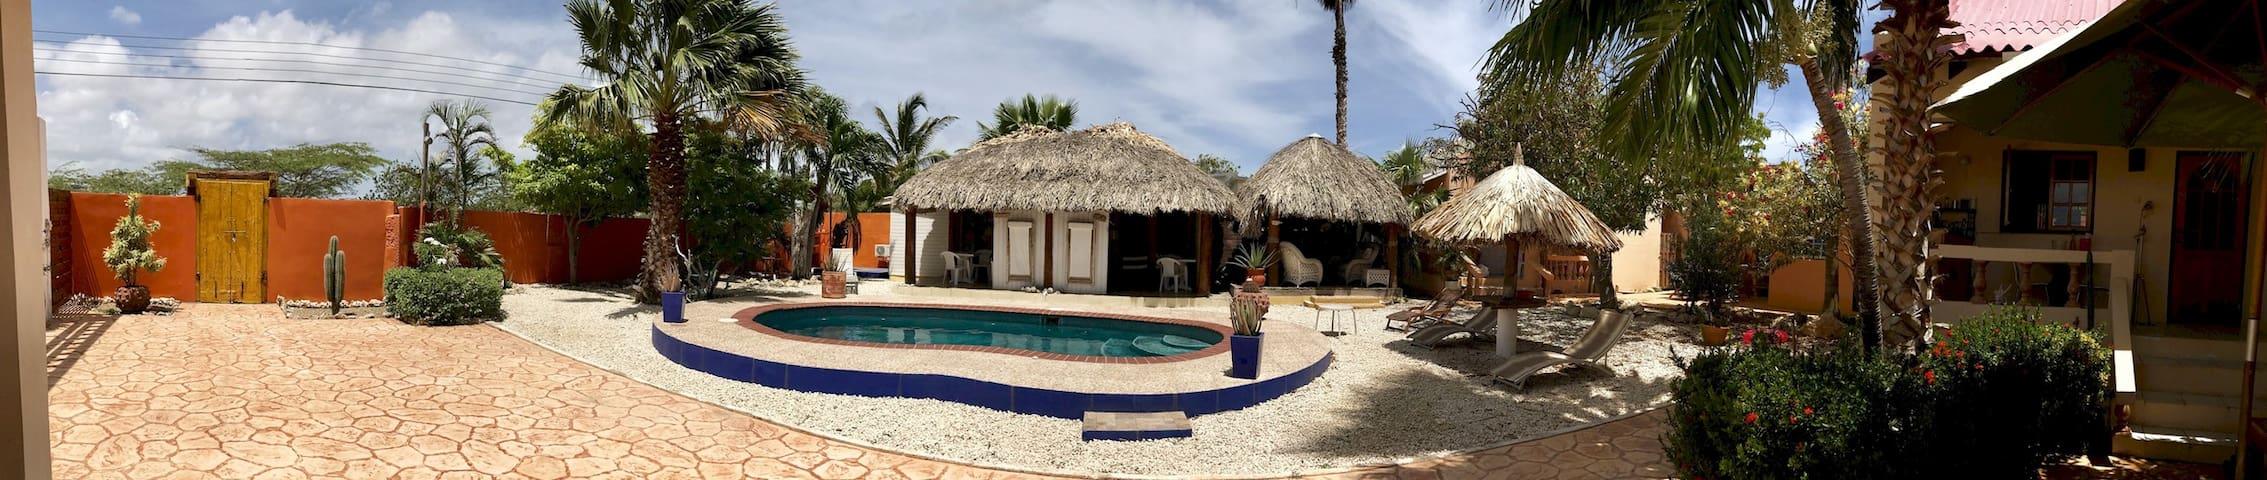 Villa Punta Salina: Arubian House 2